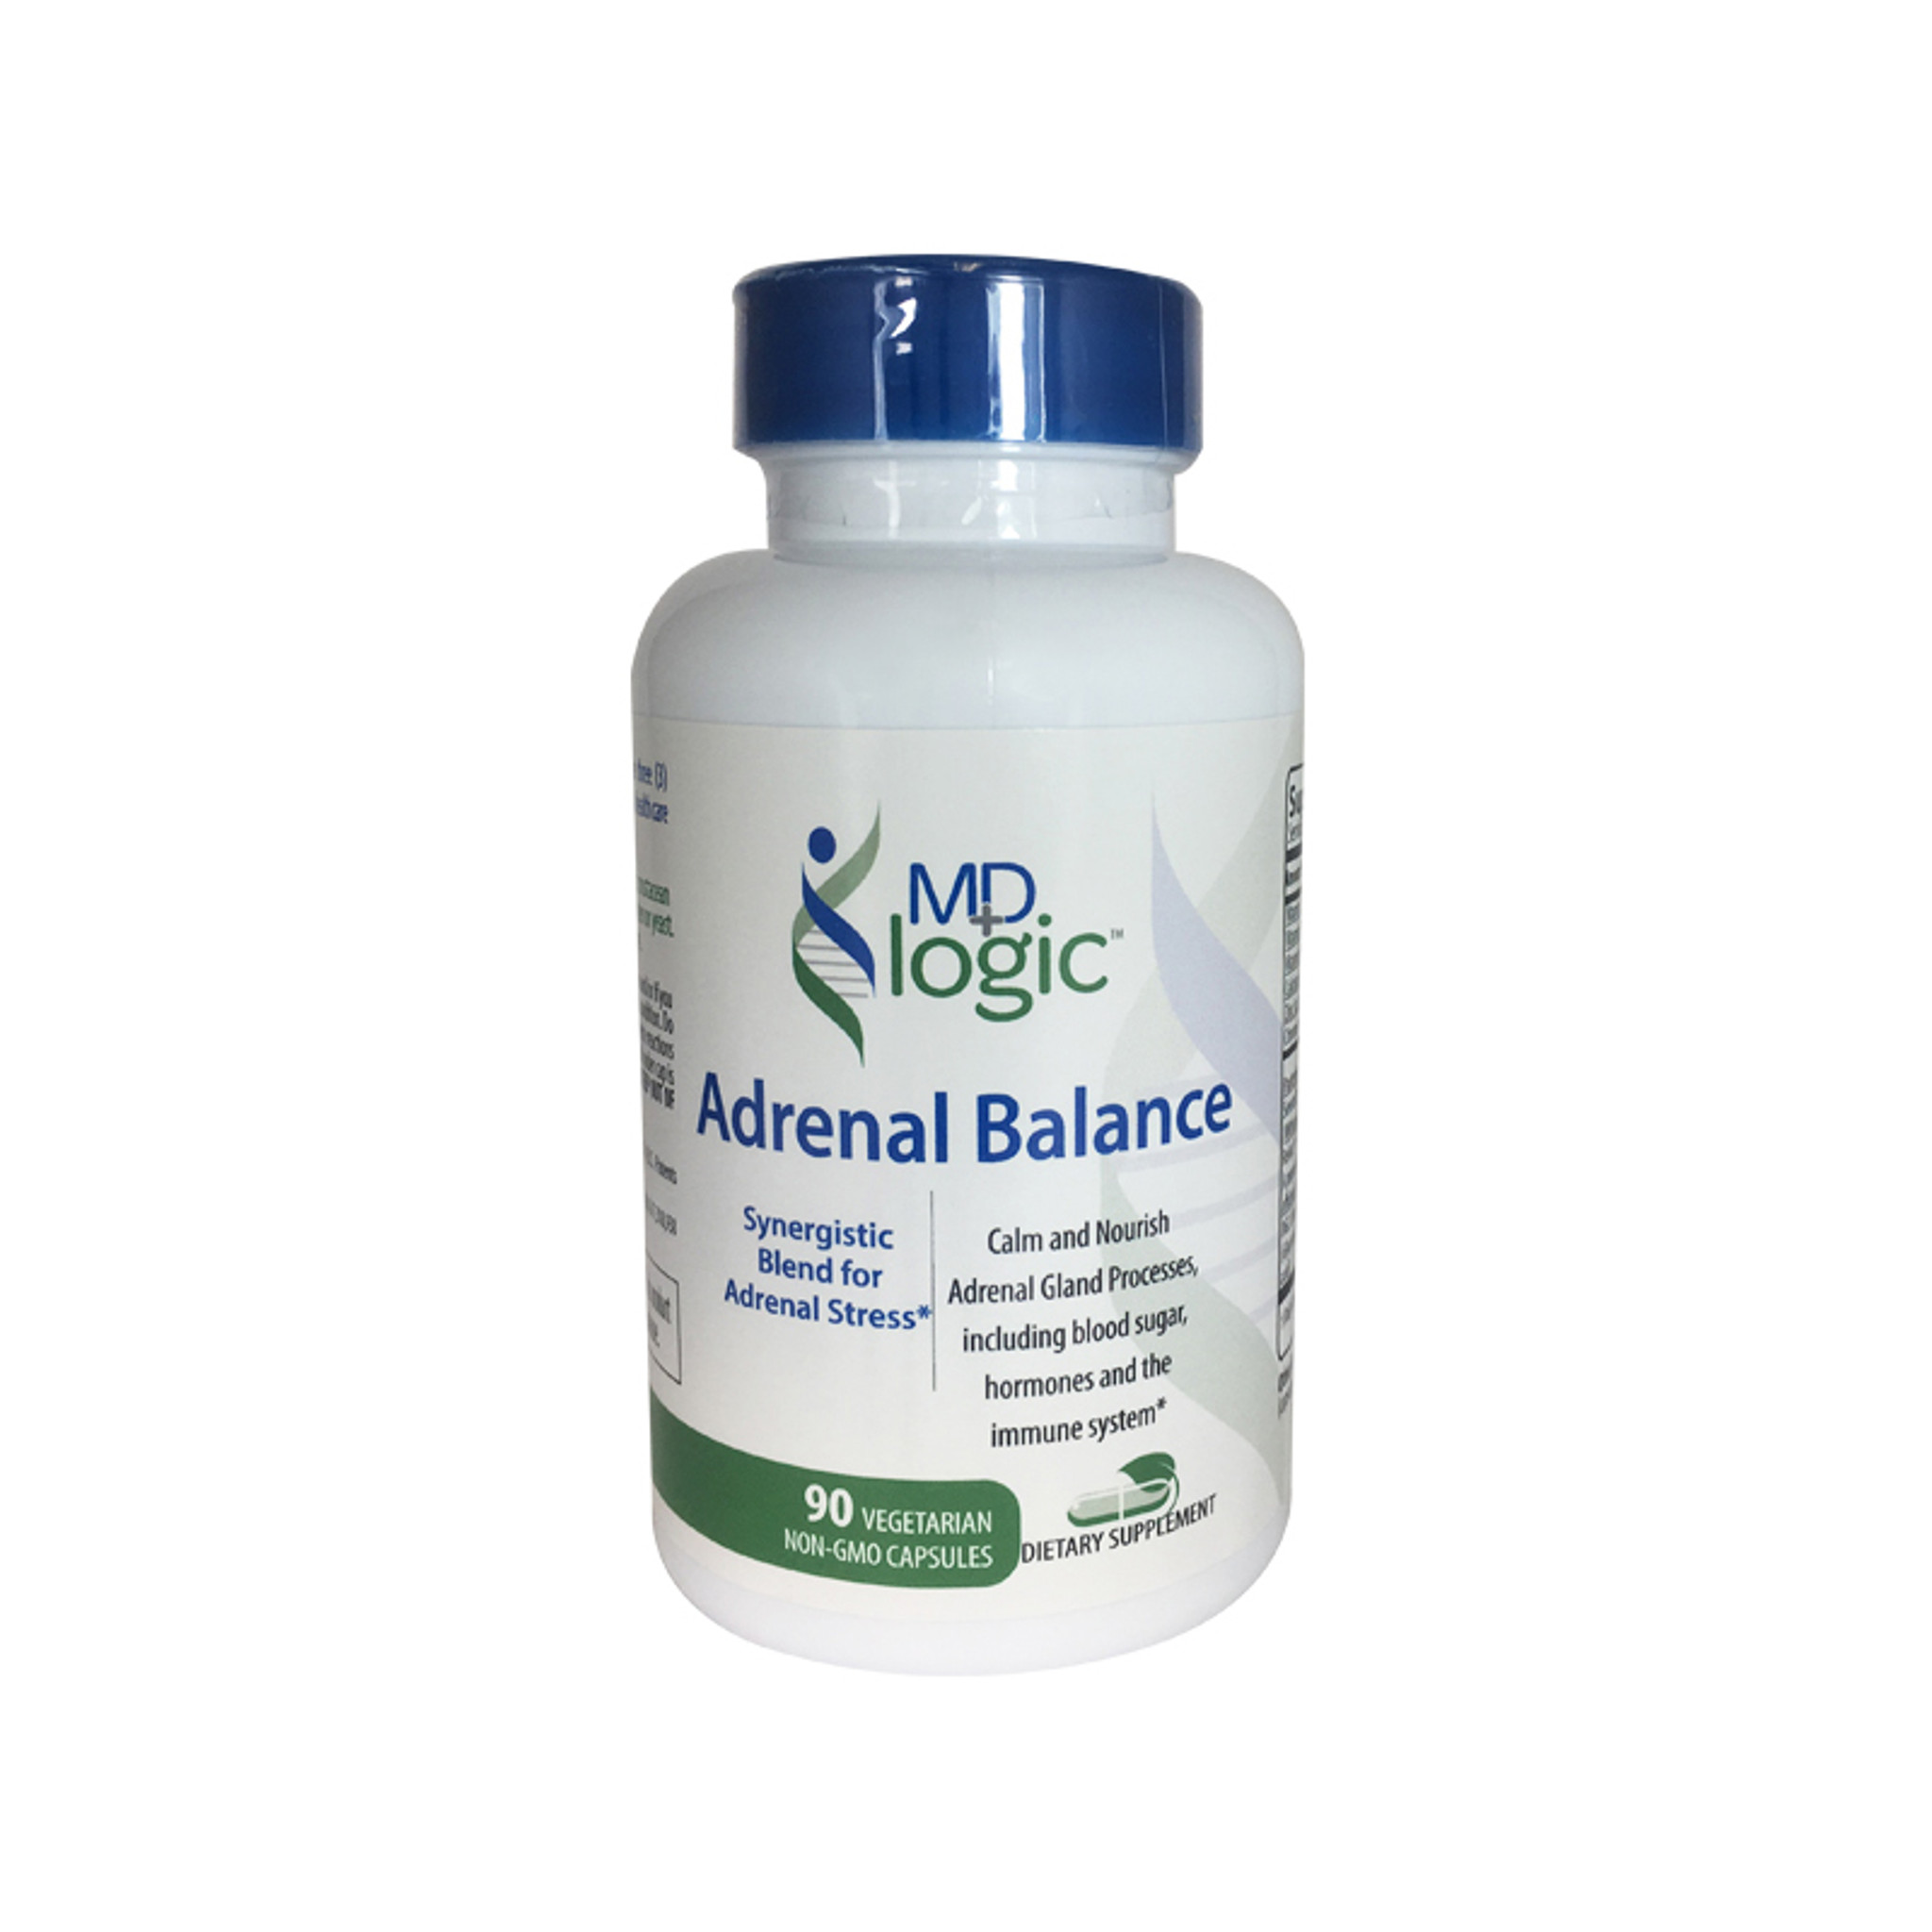 Adrenal Balance